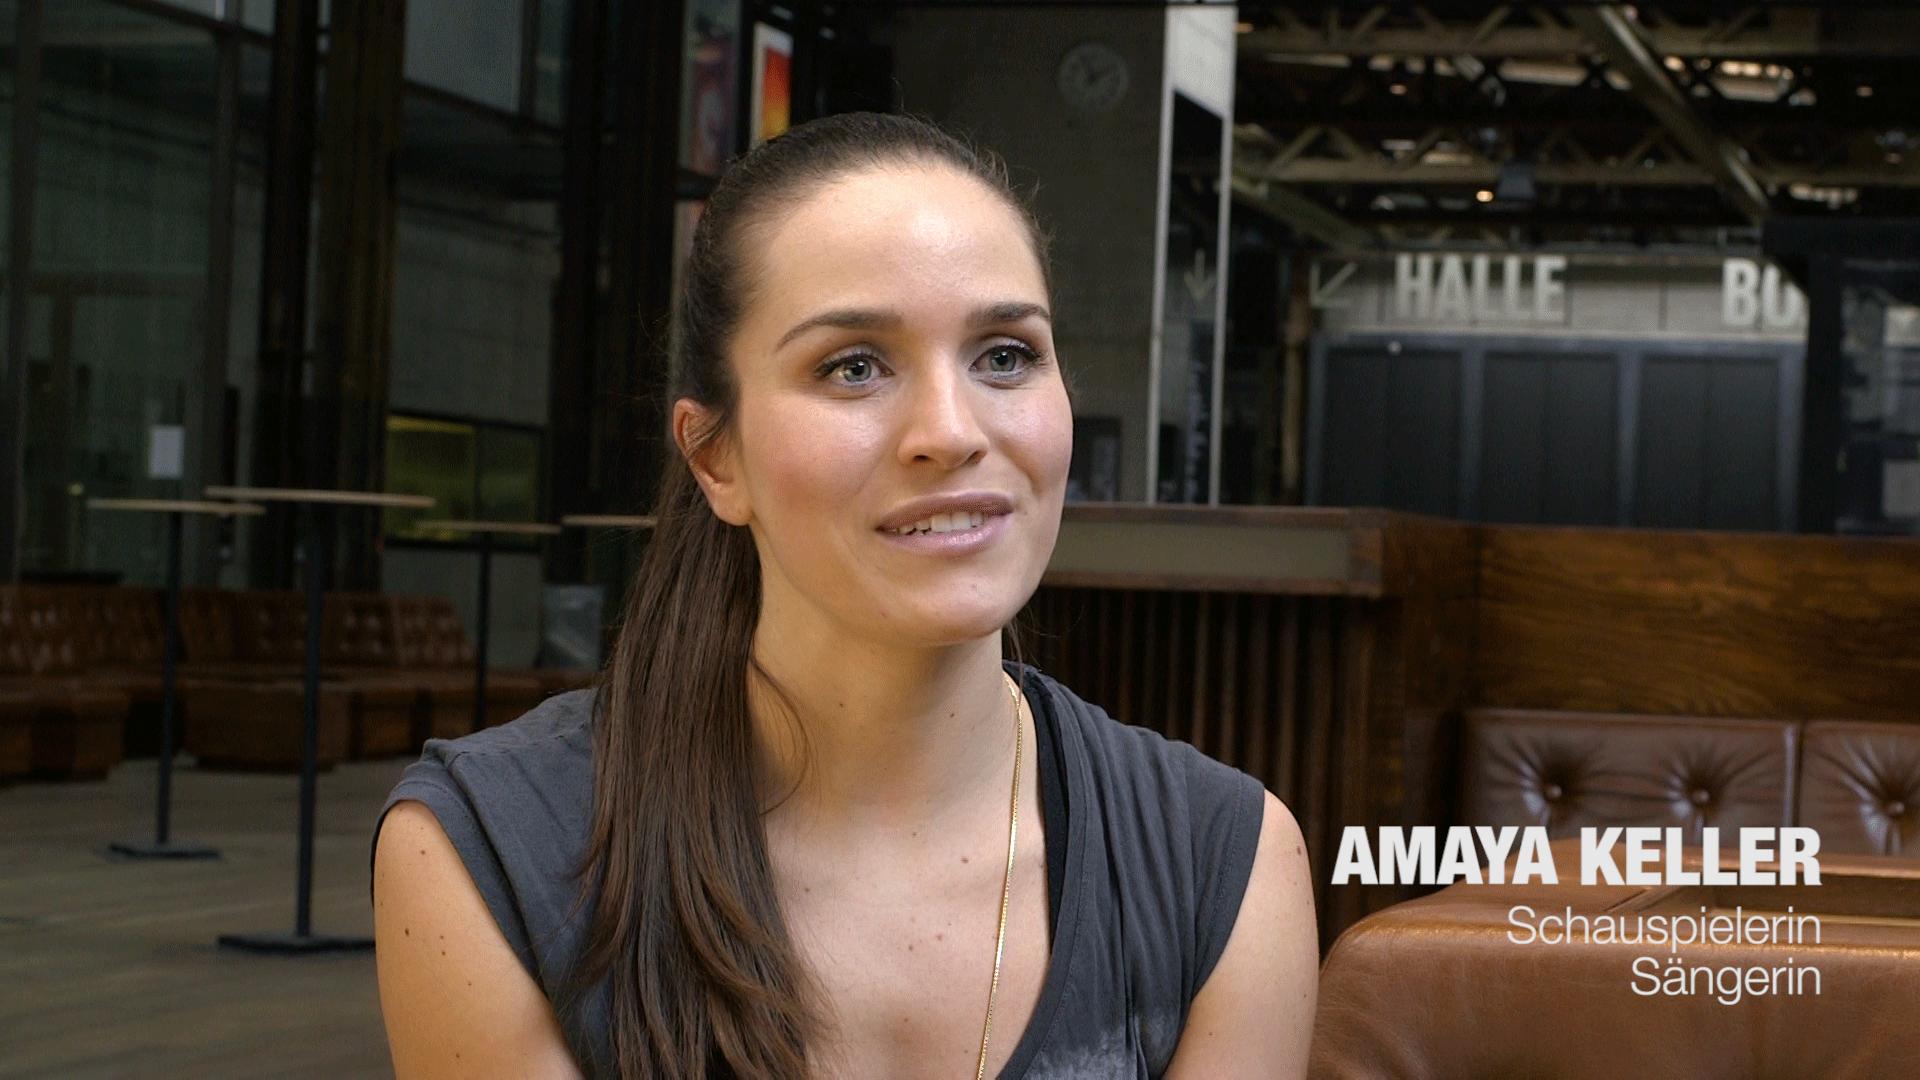 AMAYA KELLER – Portrait / Interview